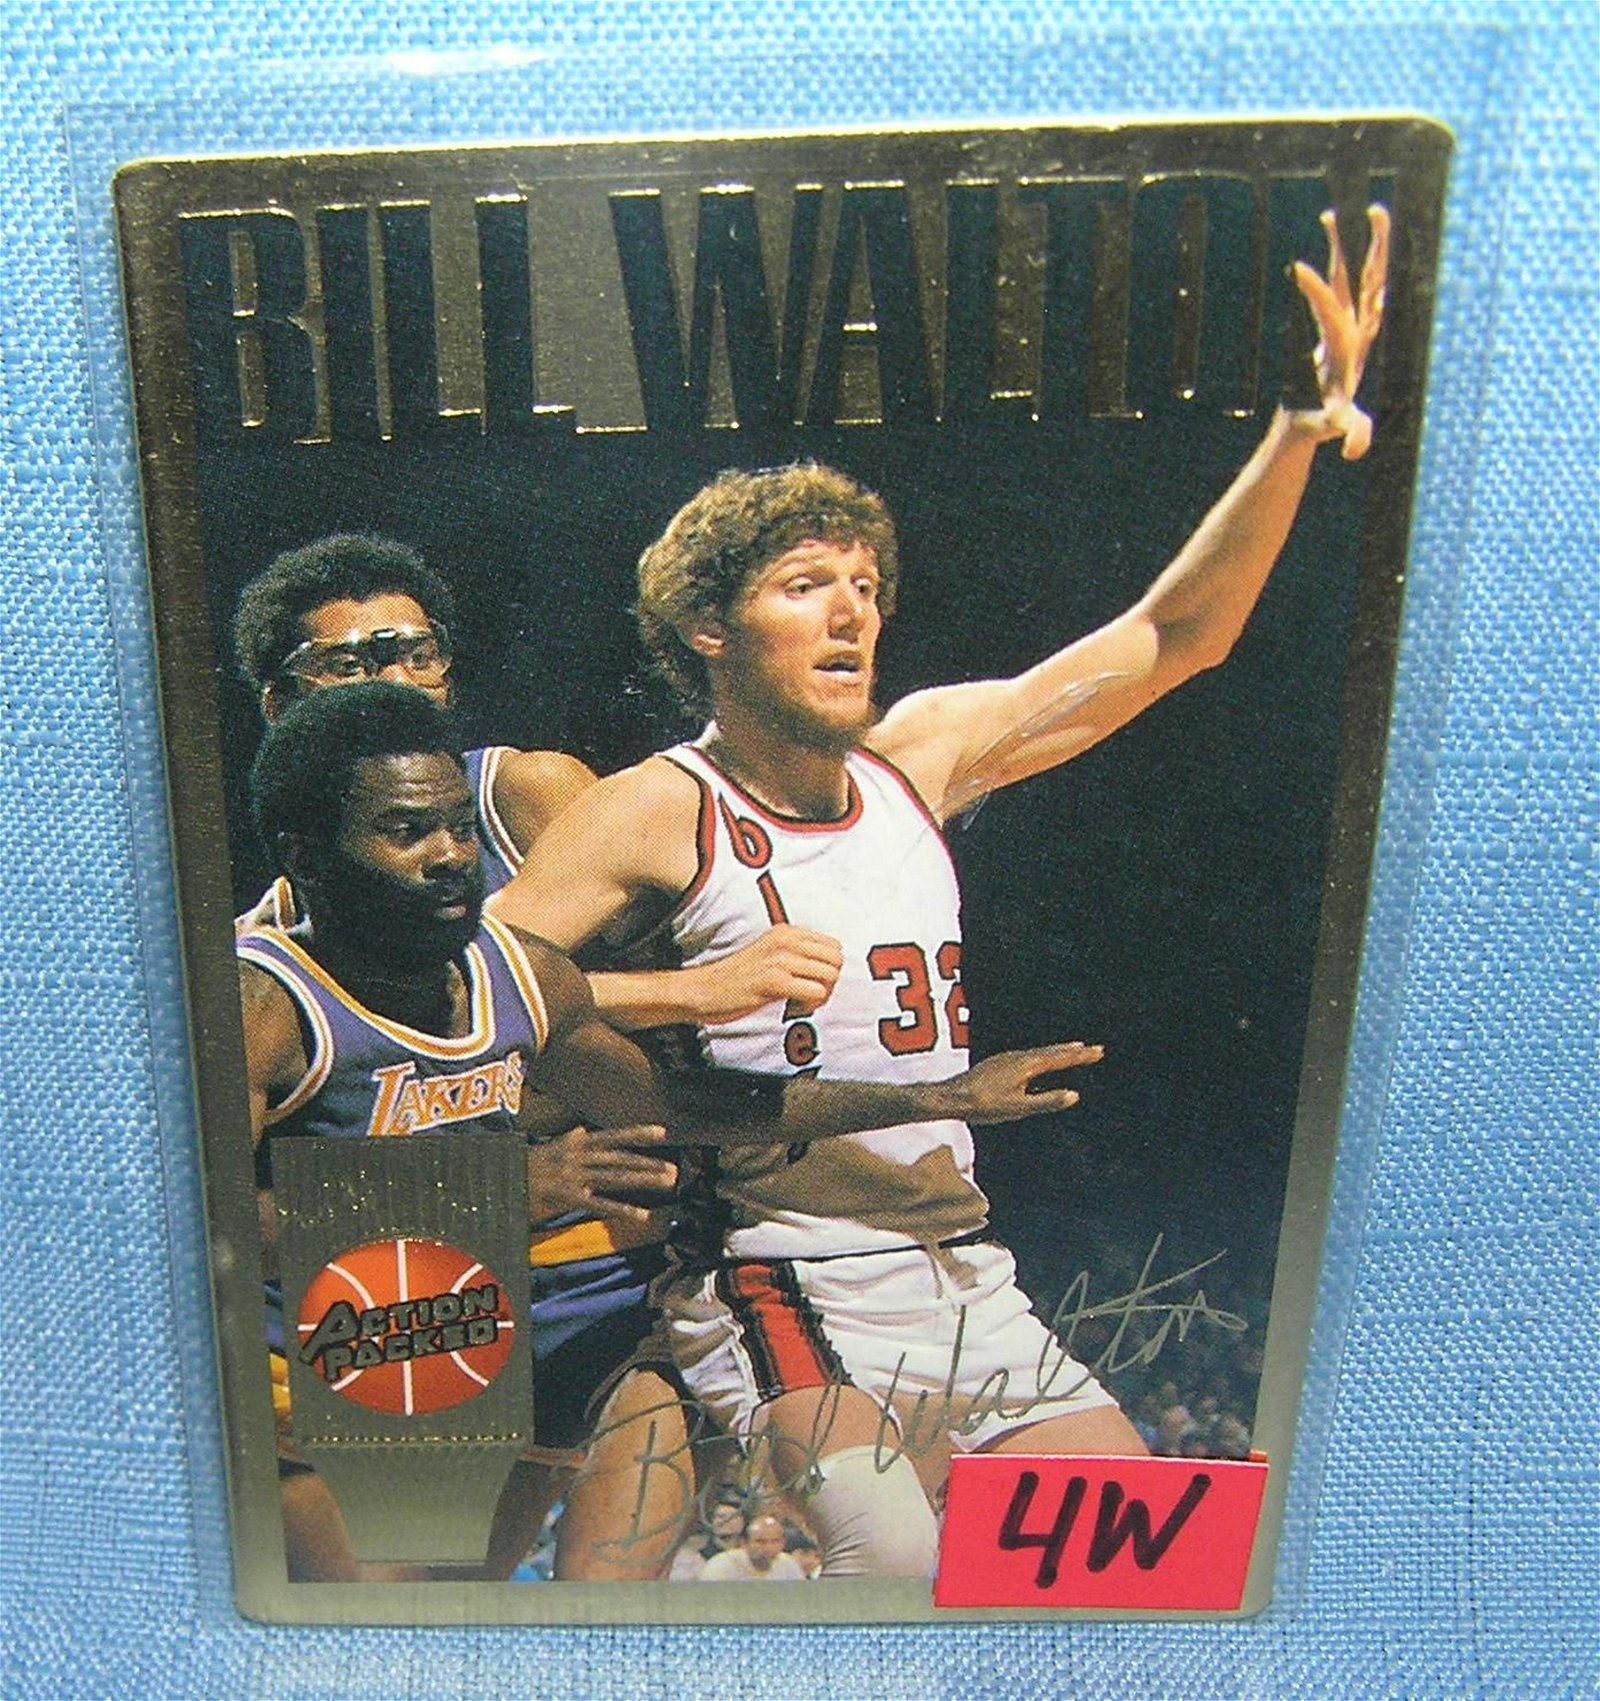 Vintage Bill Walton all star basketball card